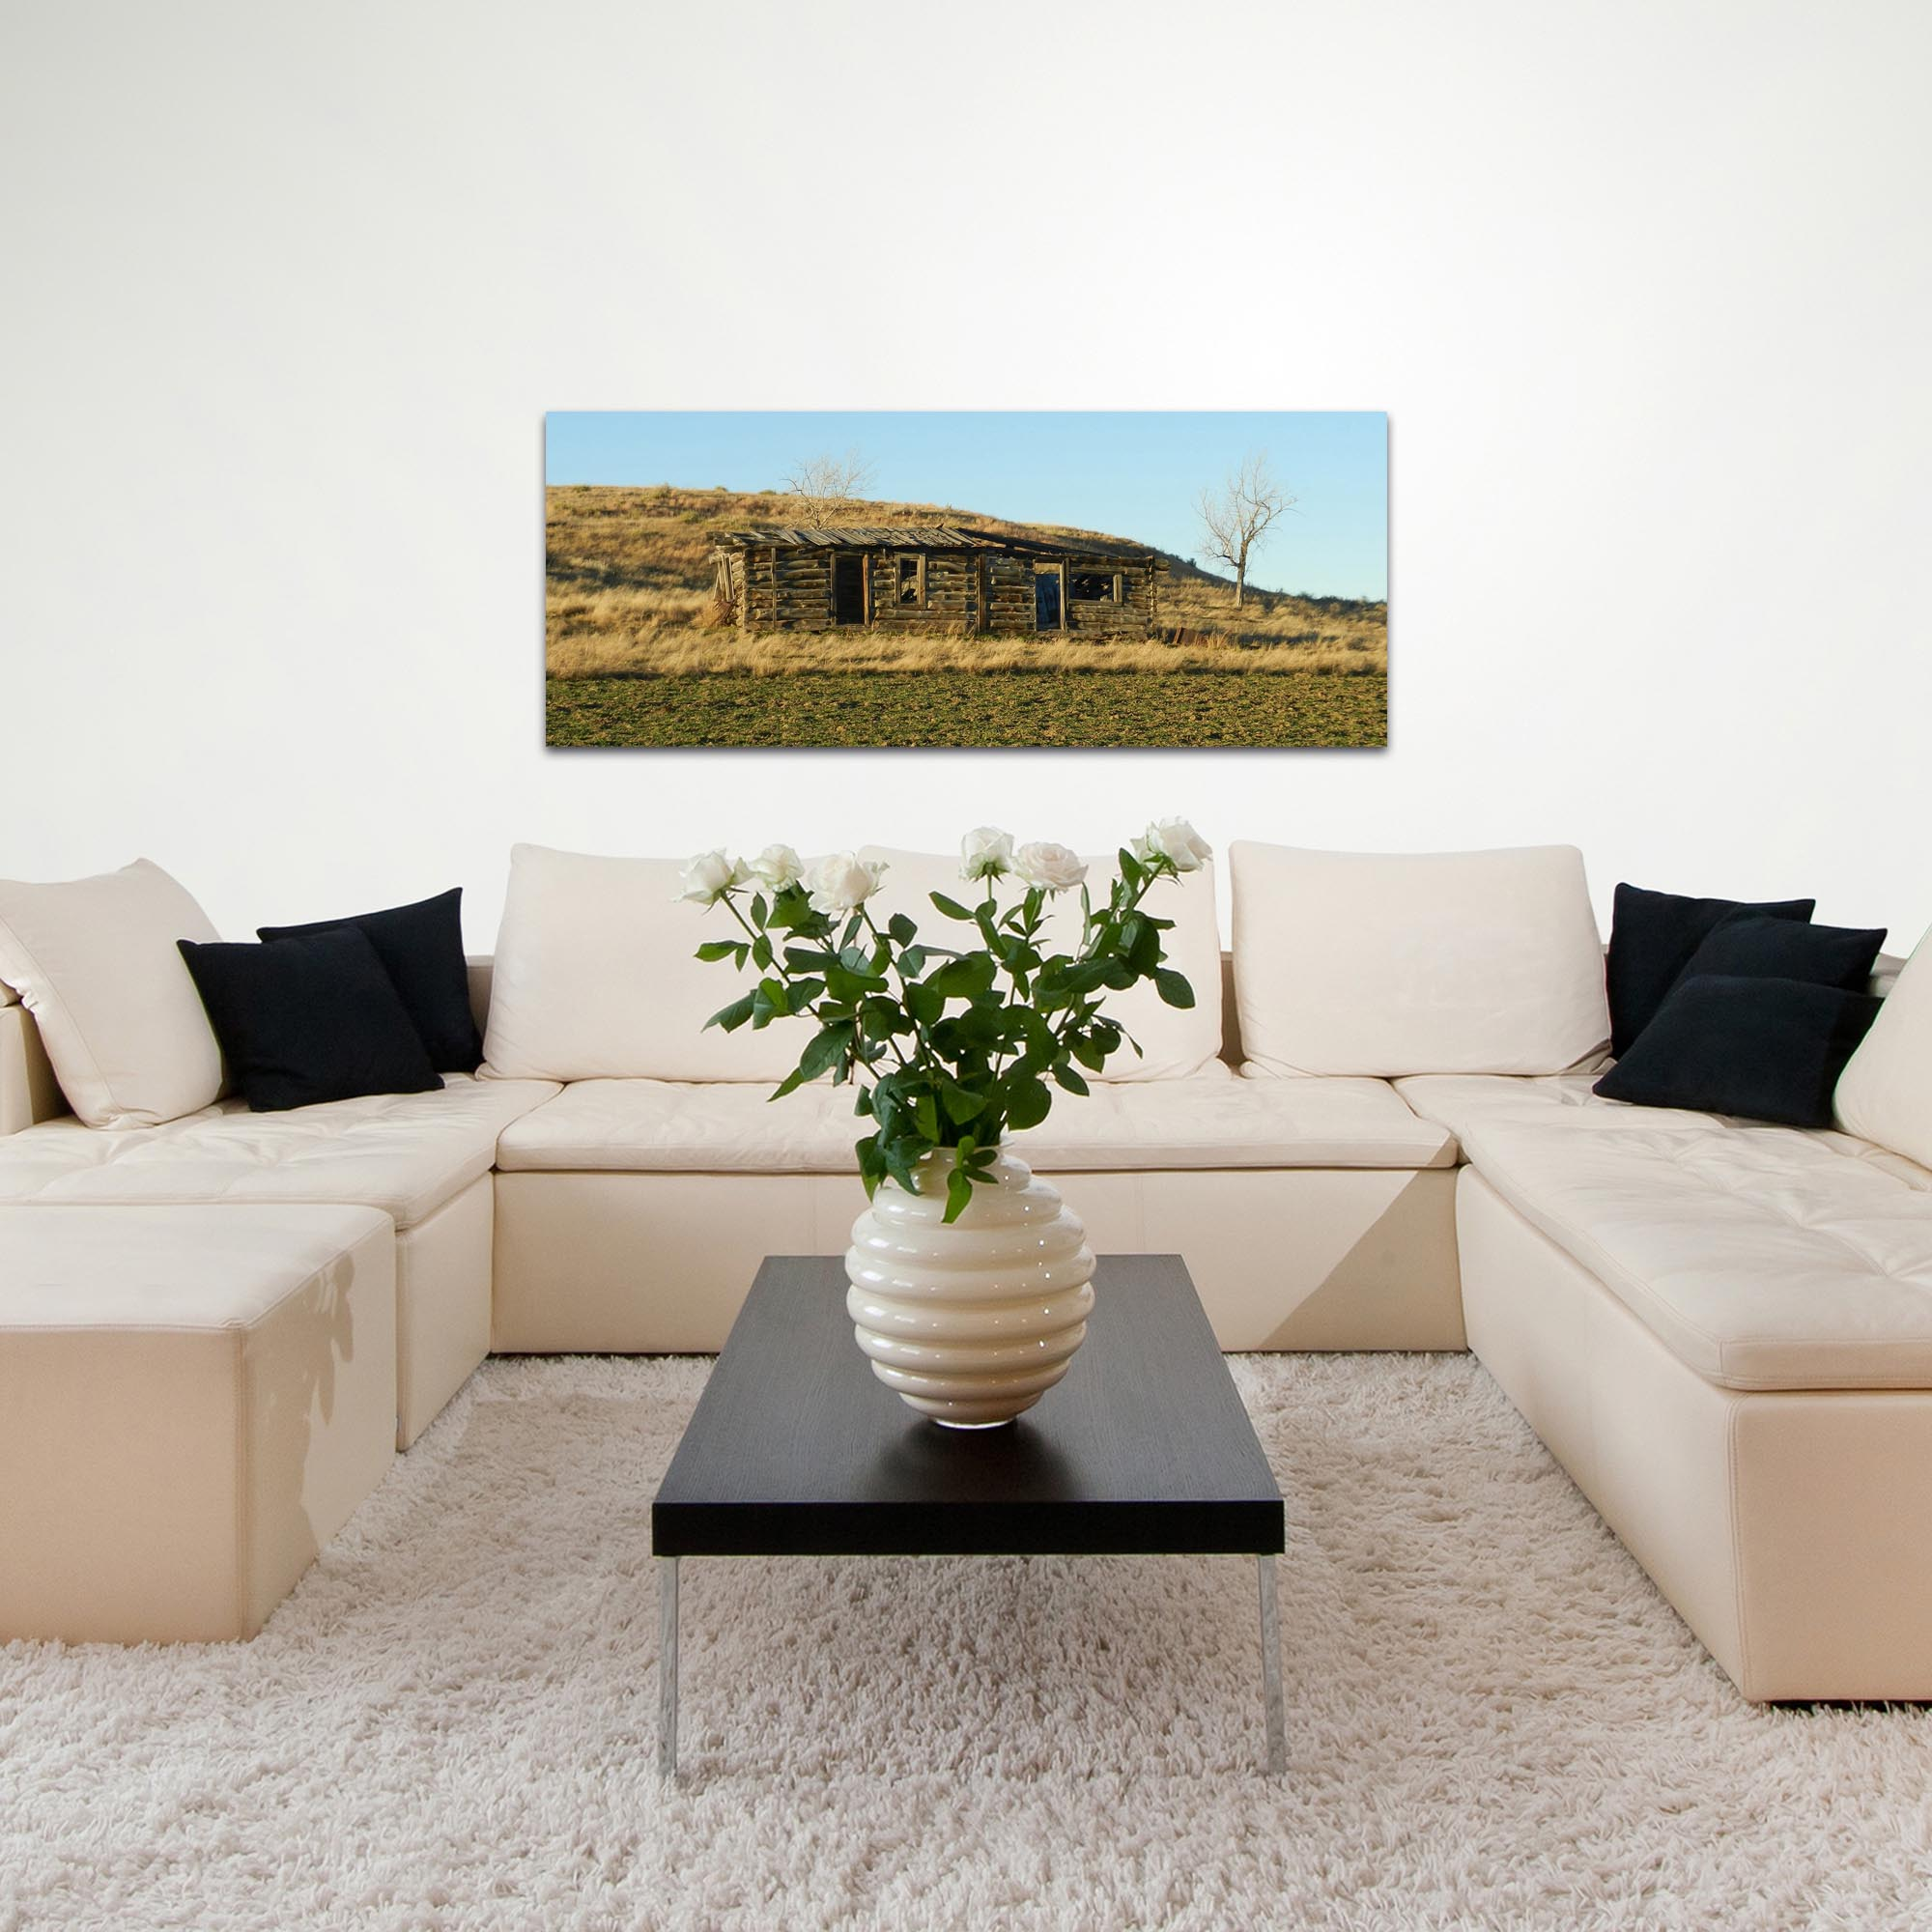 Western Wall Art 'The Hillside' - American West Decor on Metal or Plexiglass - Lifestyle View